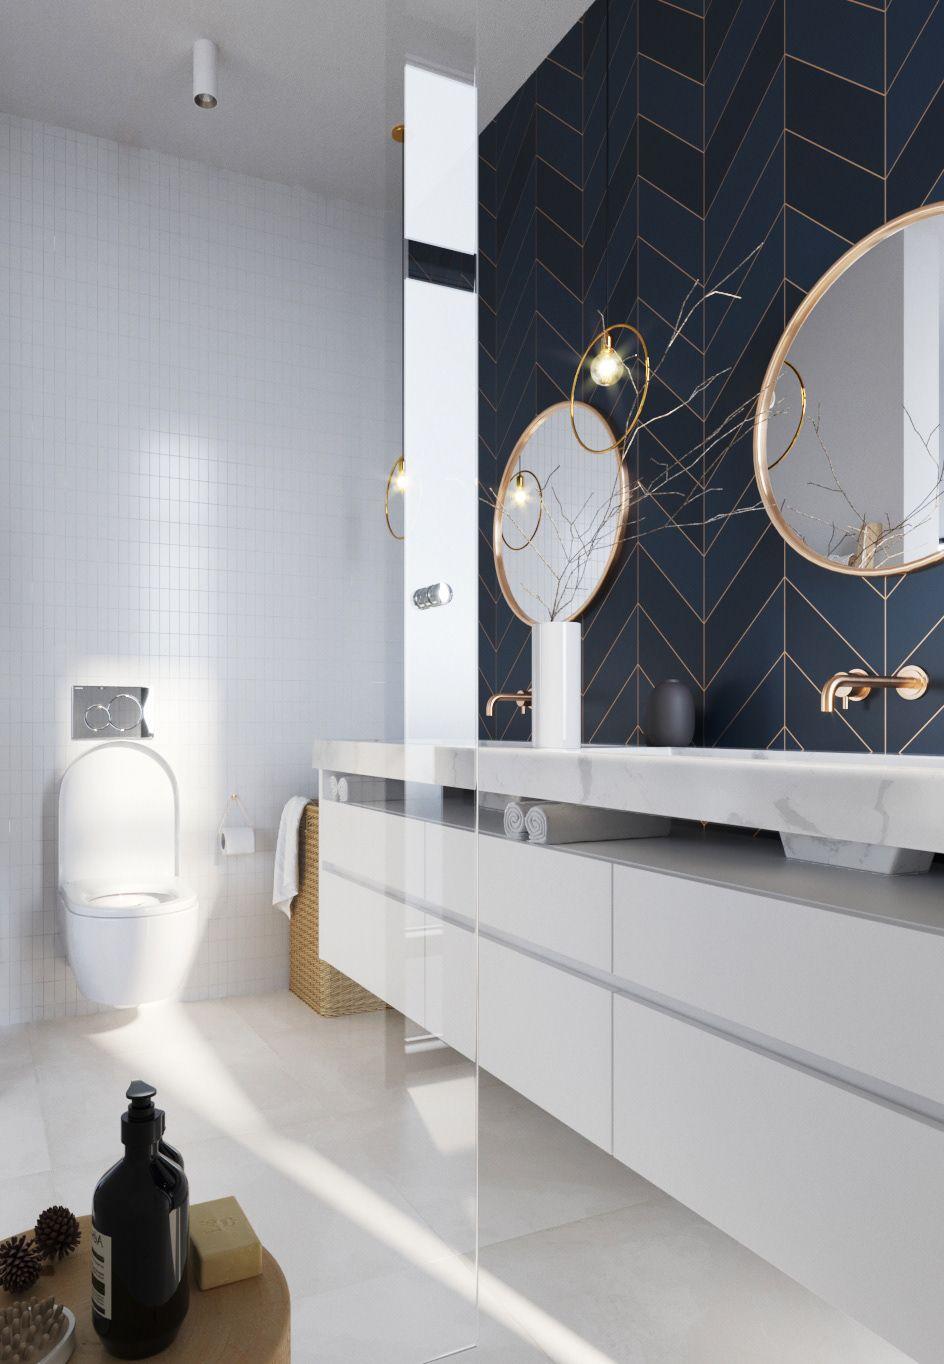 BADEZIMMER WC TOILET WANDLEUCHTE ACCESSORIES ITALIAN CLASSIC DESIGN